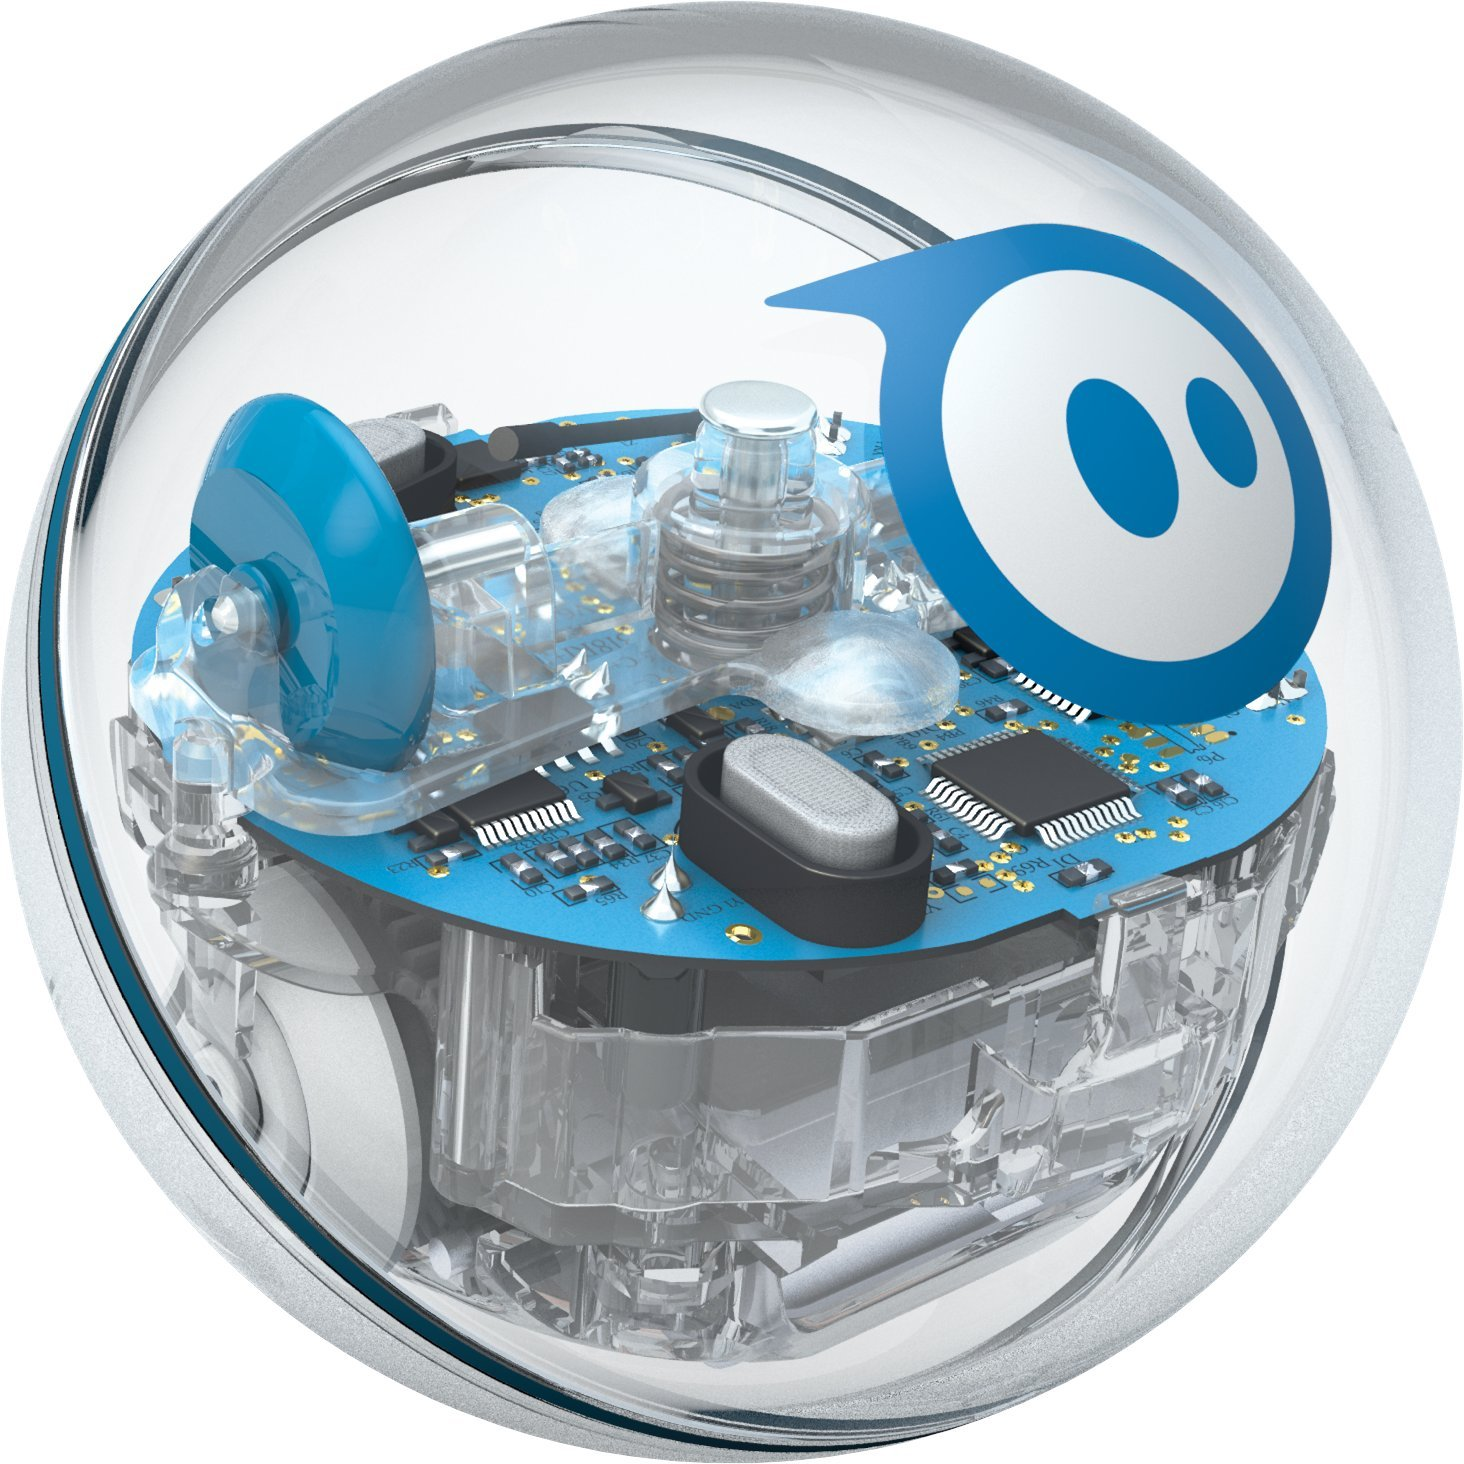 Sphero SPRK with Steam Educational Robot, Multi Color